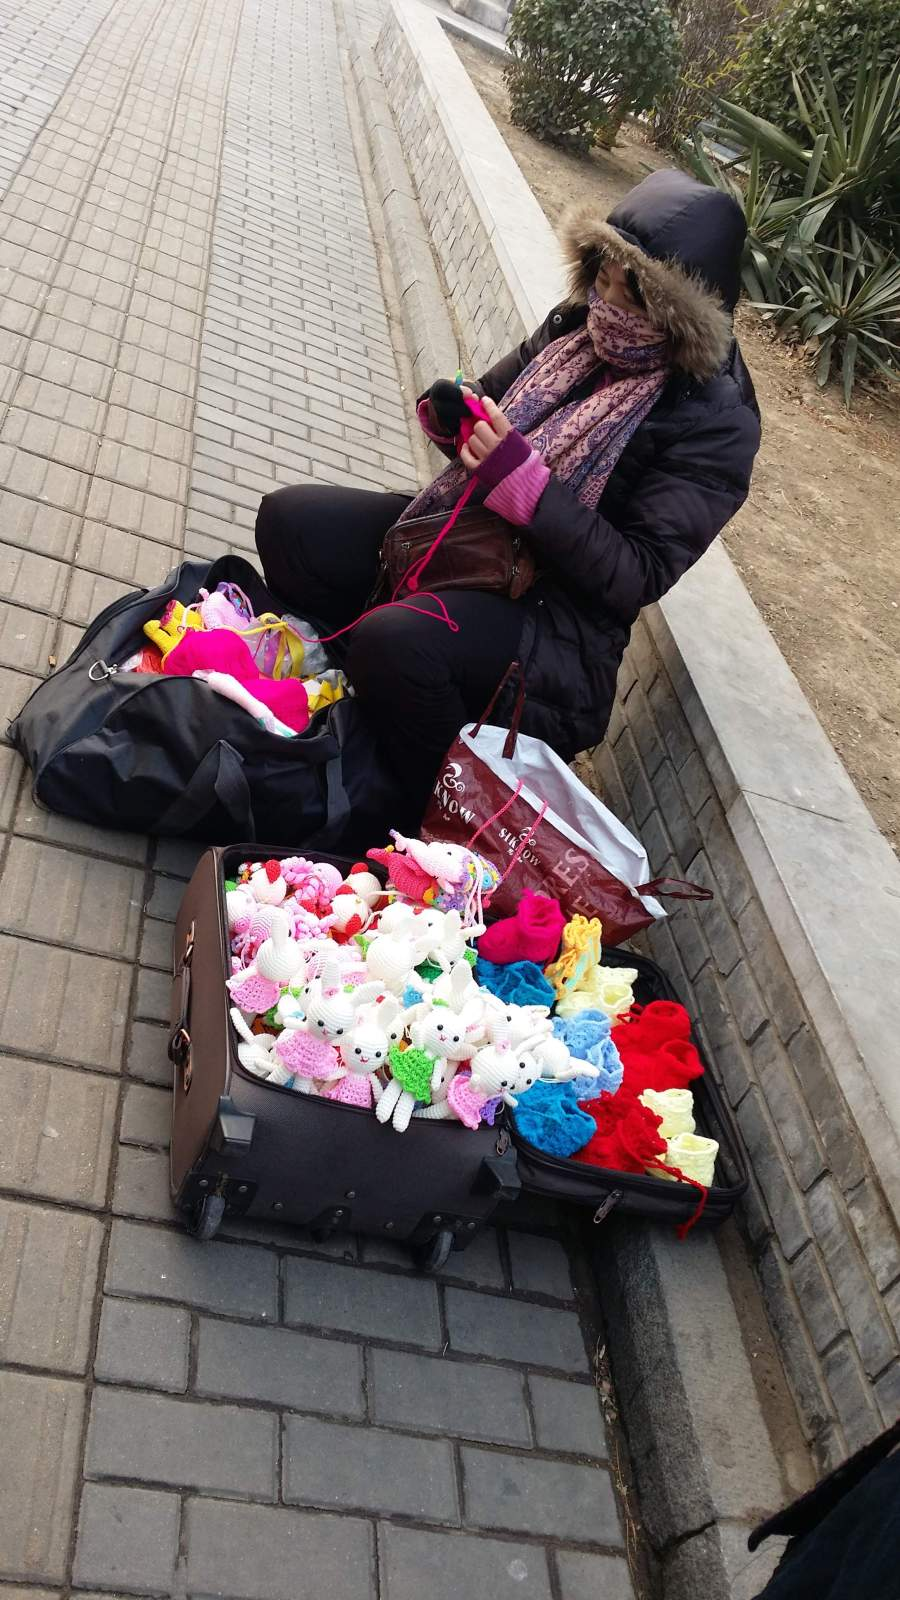 street crochet outside or apartment